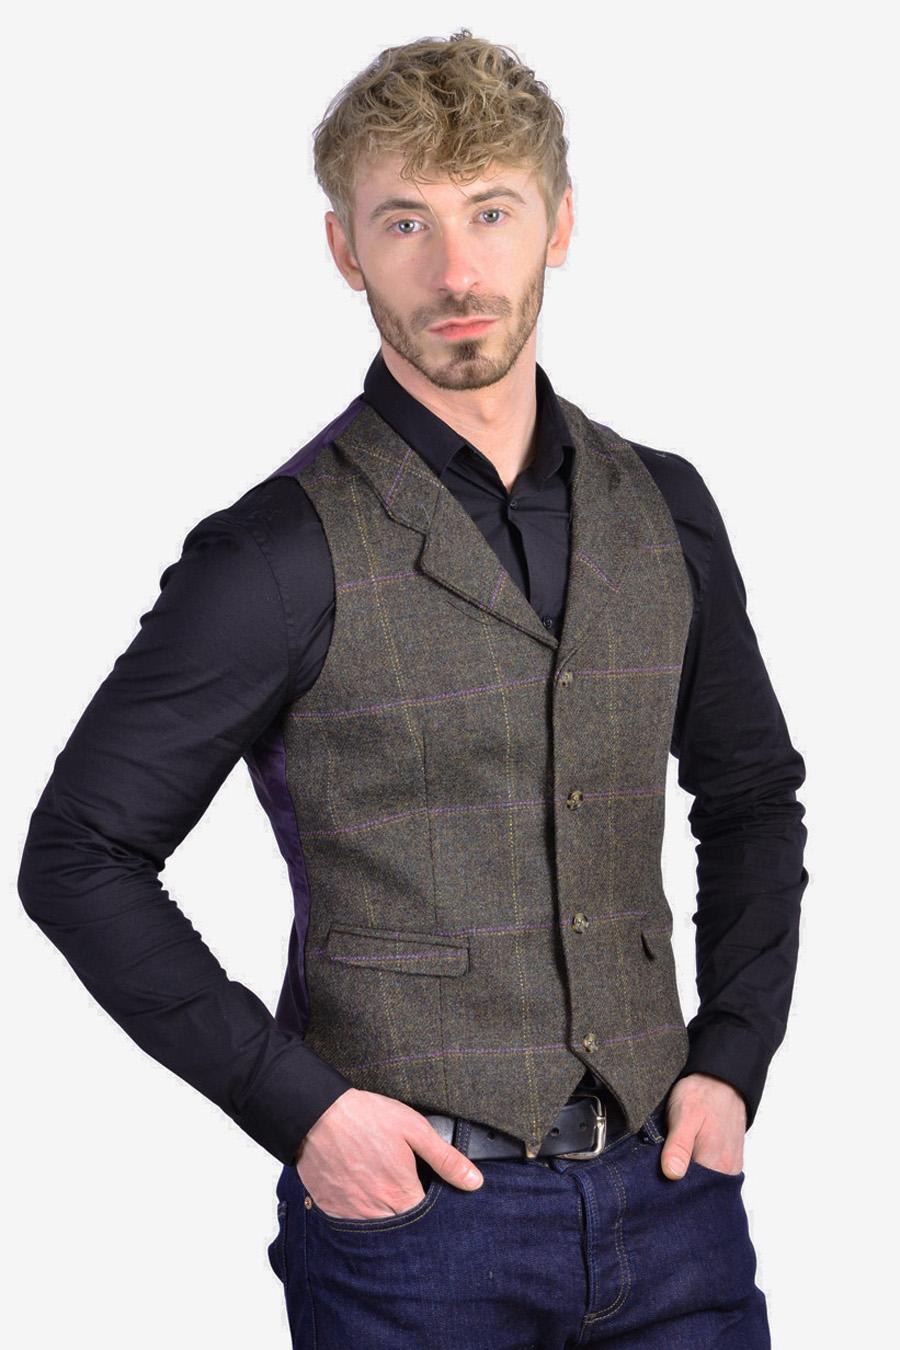 Vintage men's check tweed waistcoat